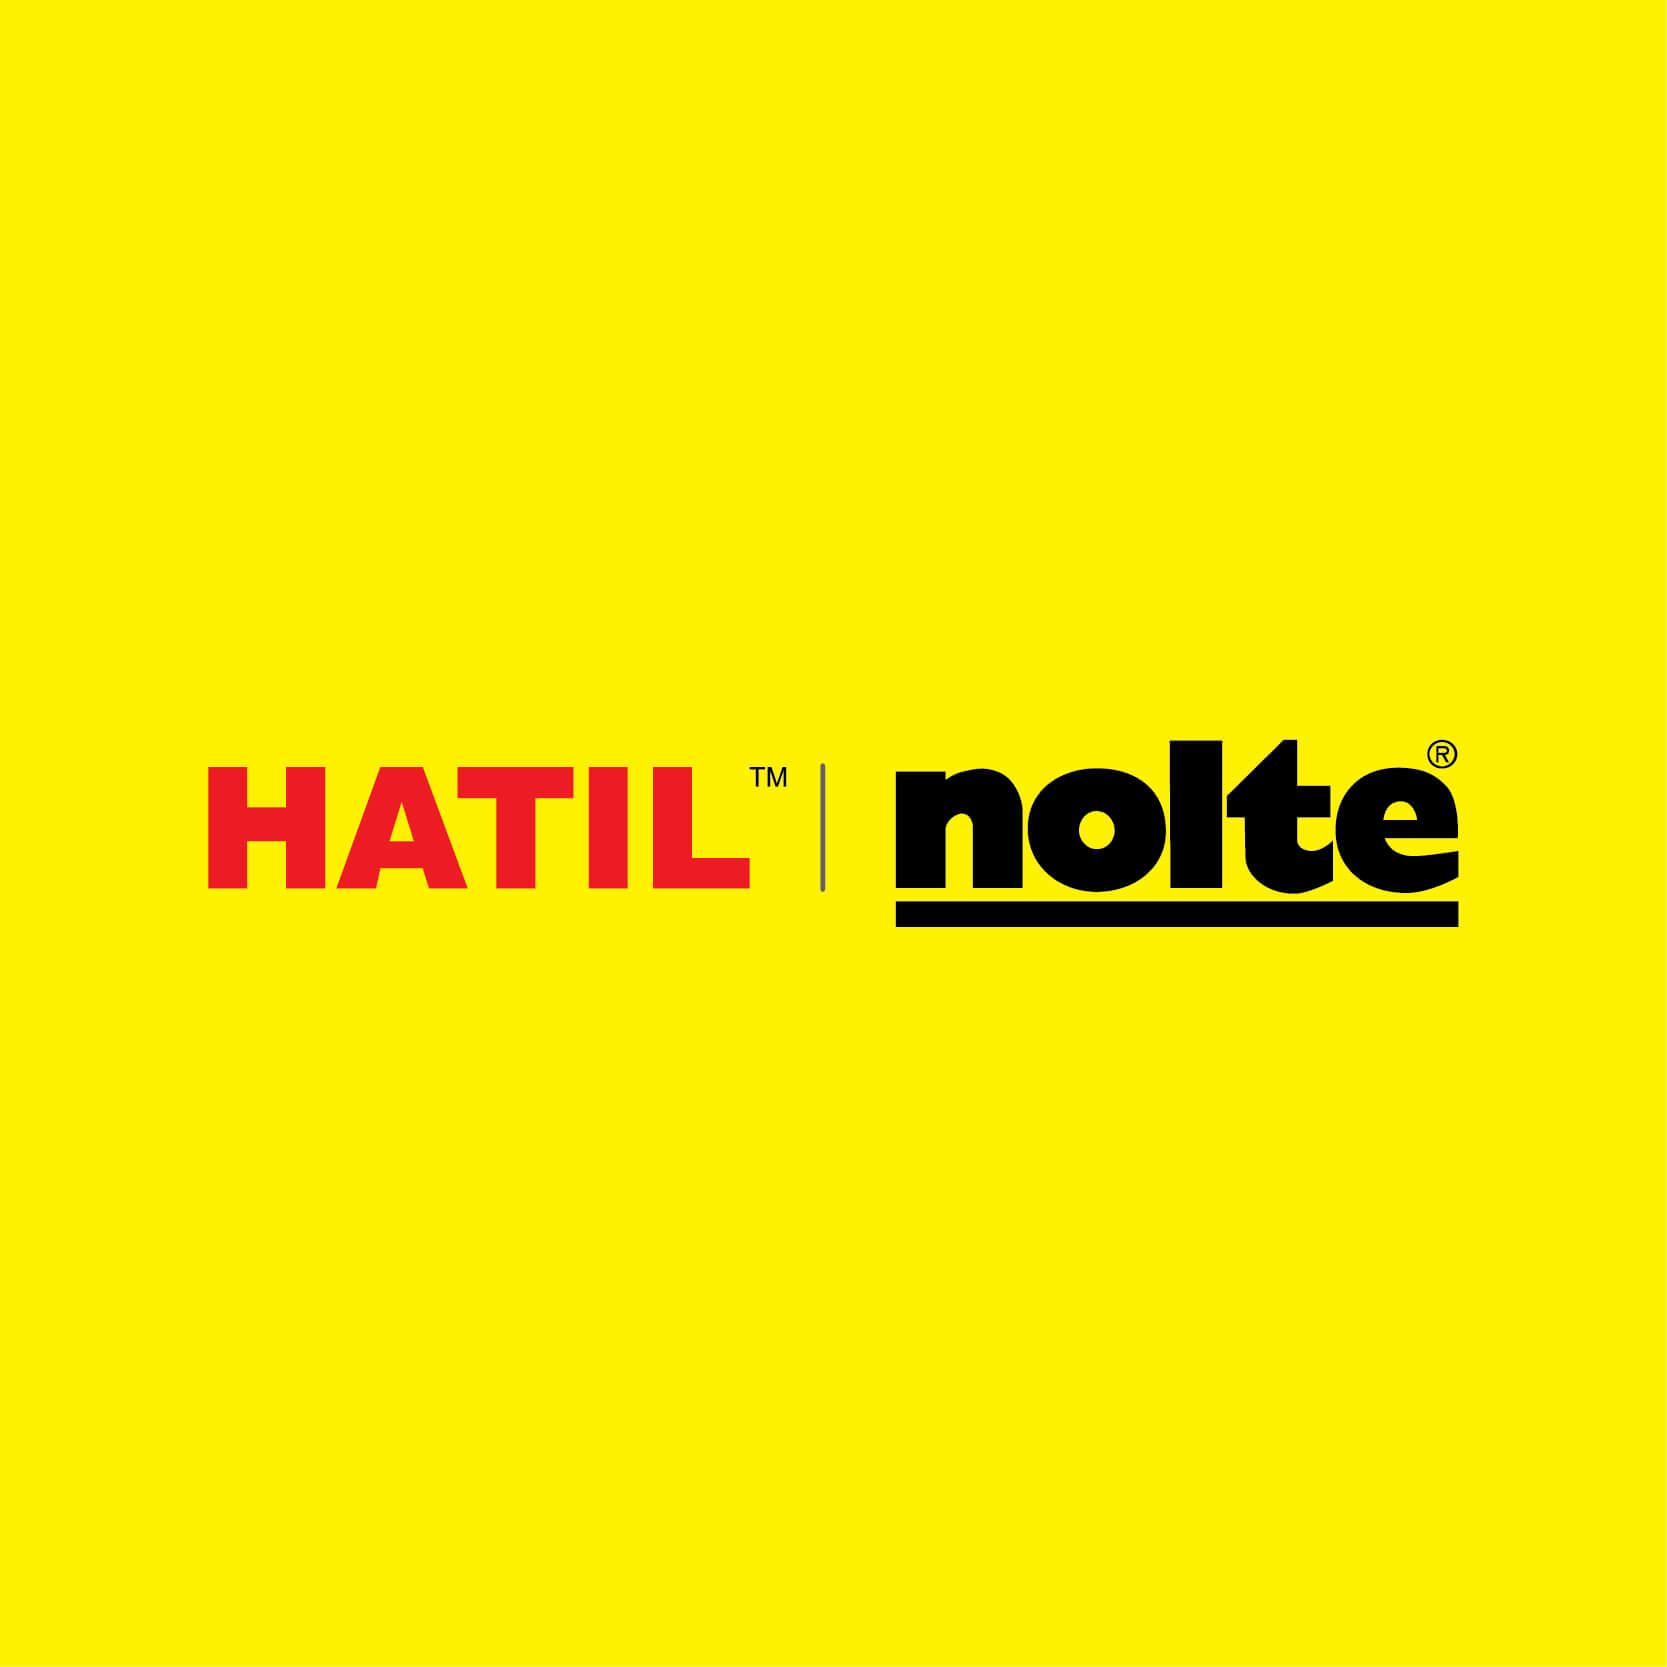 DTC-Clients-Served-Logo-HATIL-NOLTE